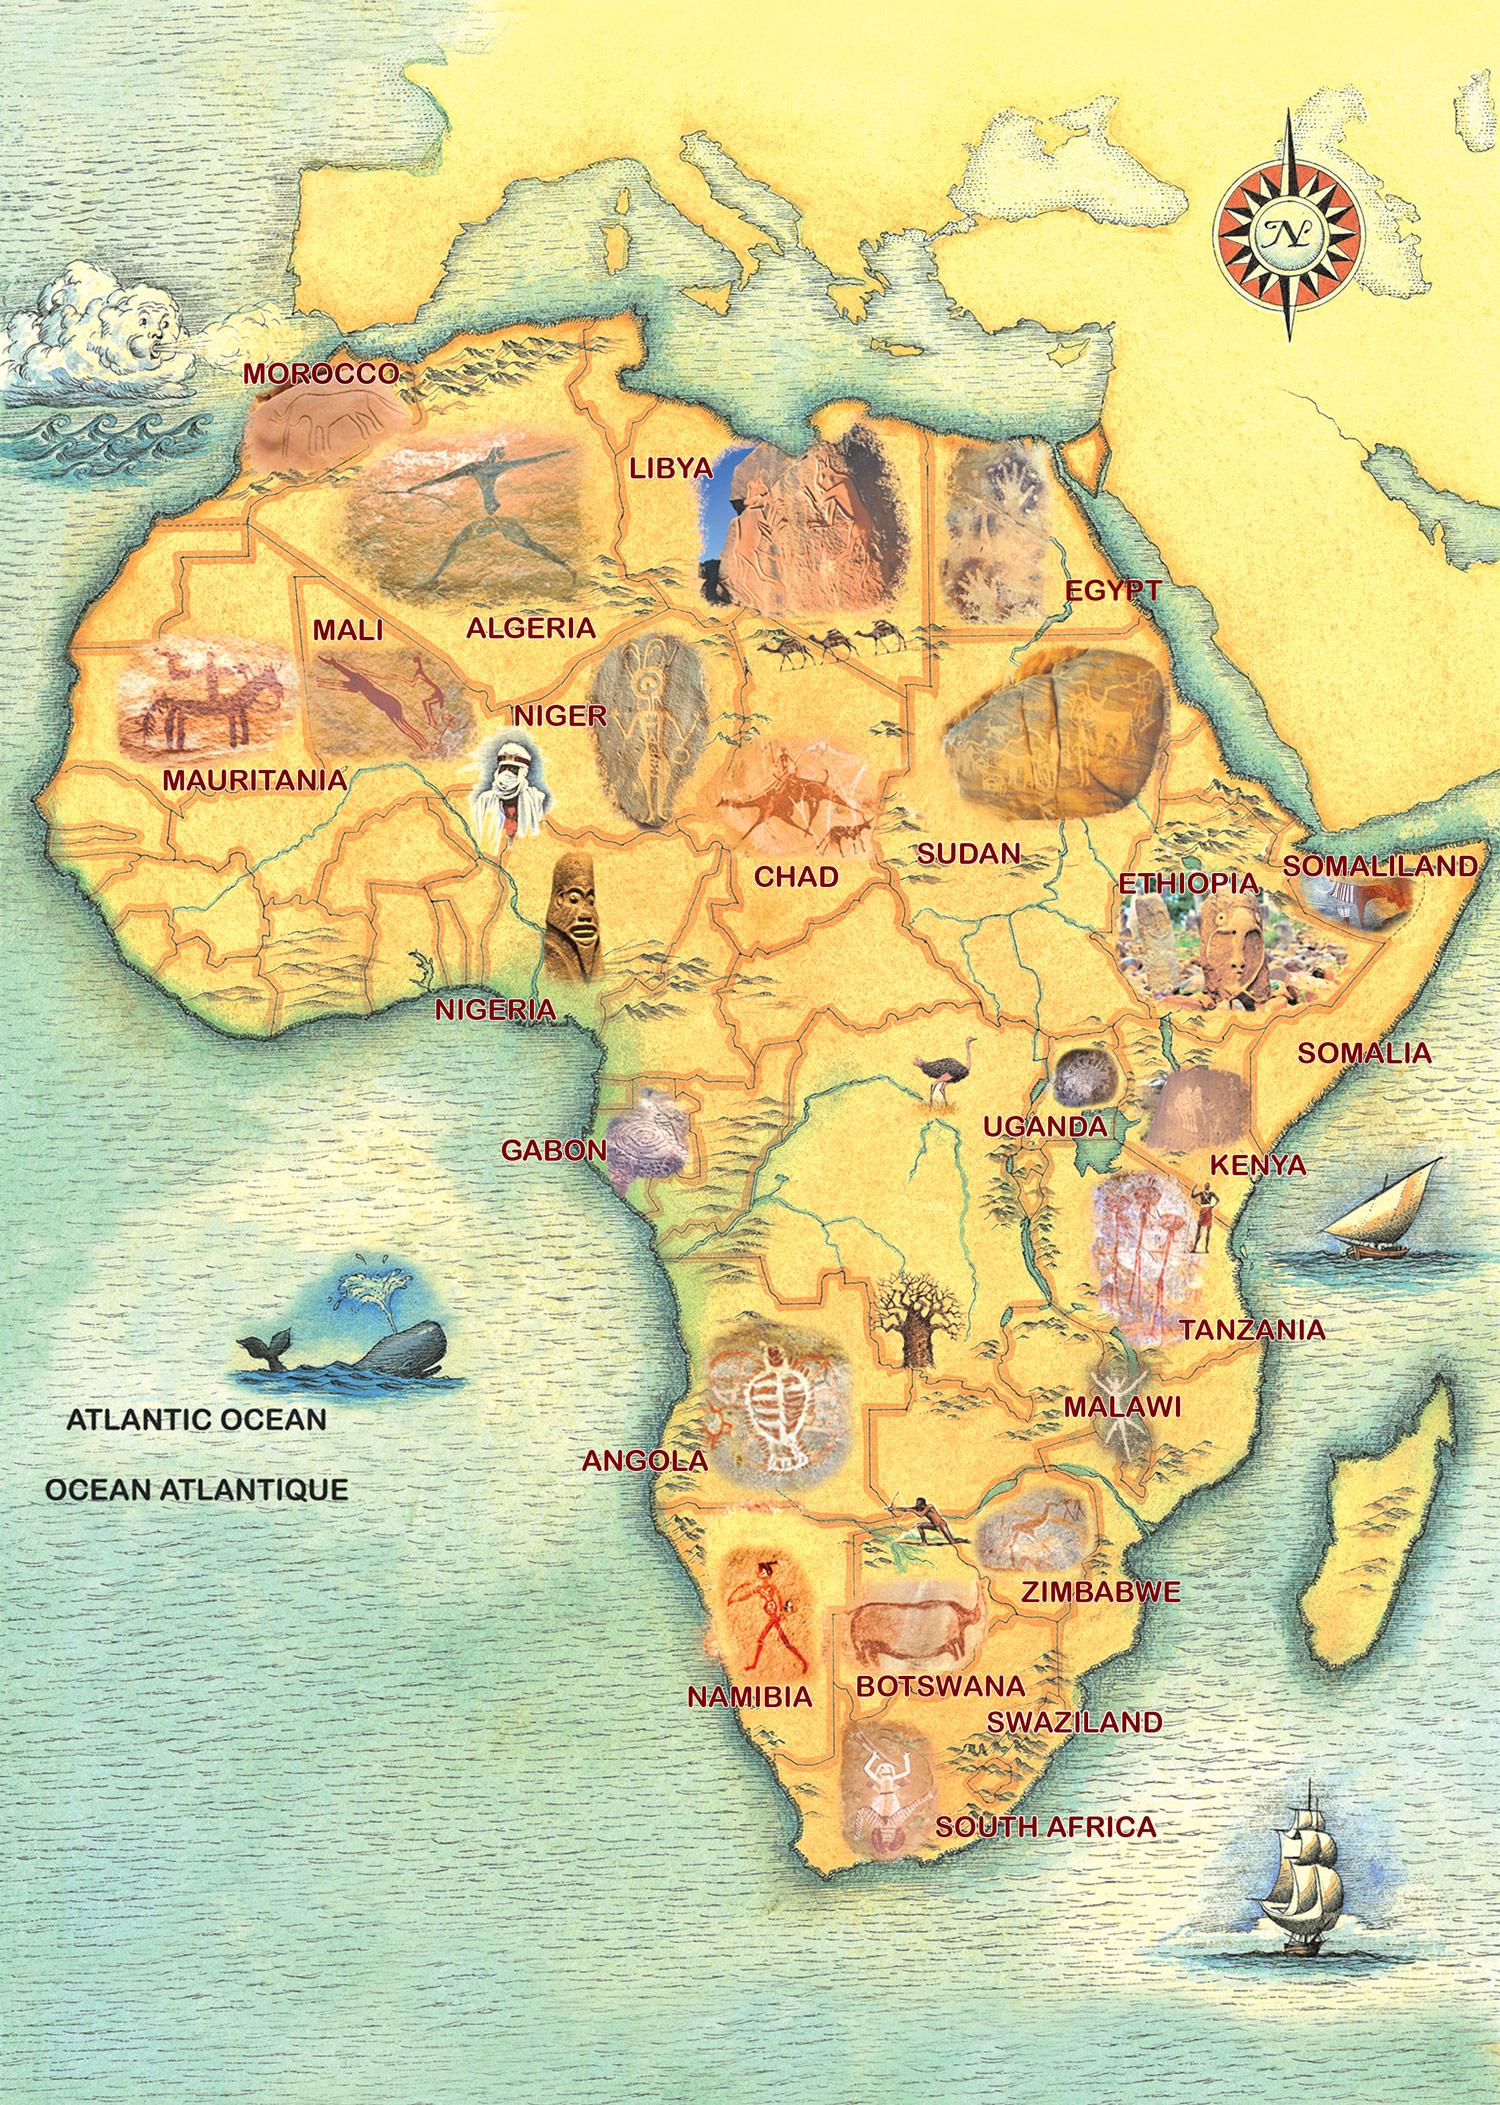 Rock Art In Africa Map,Trust For African Rock Art